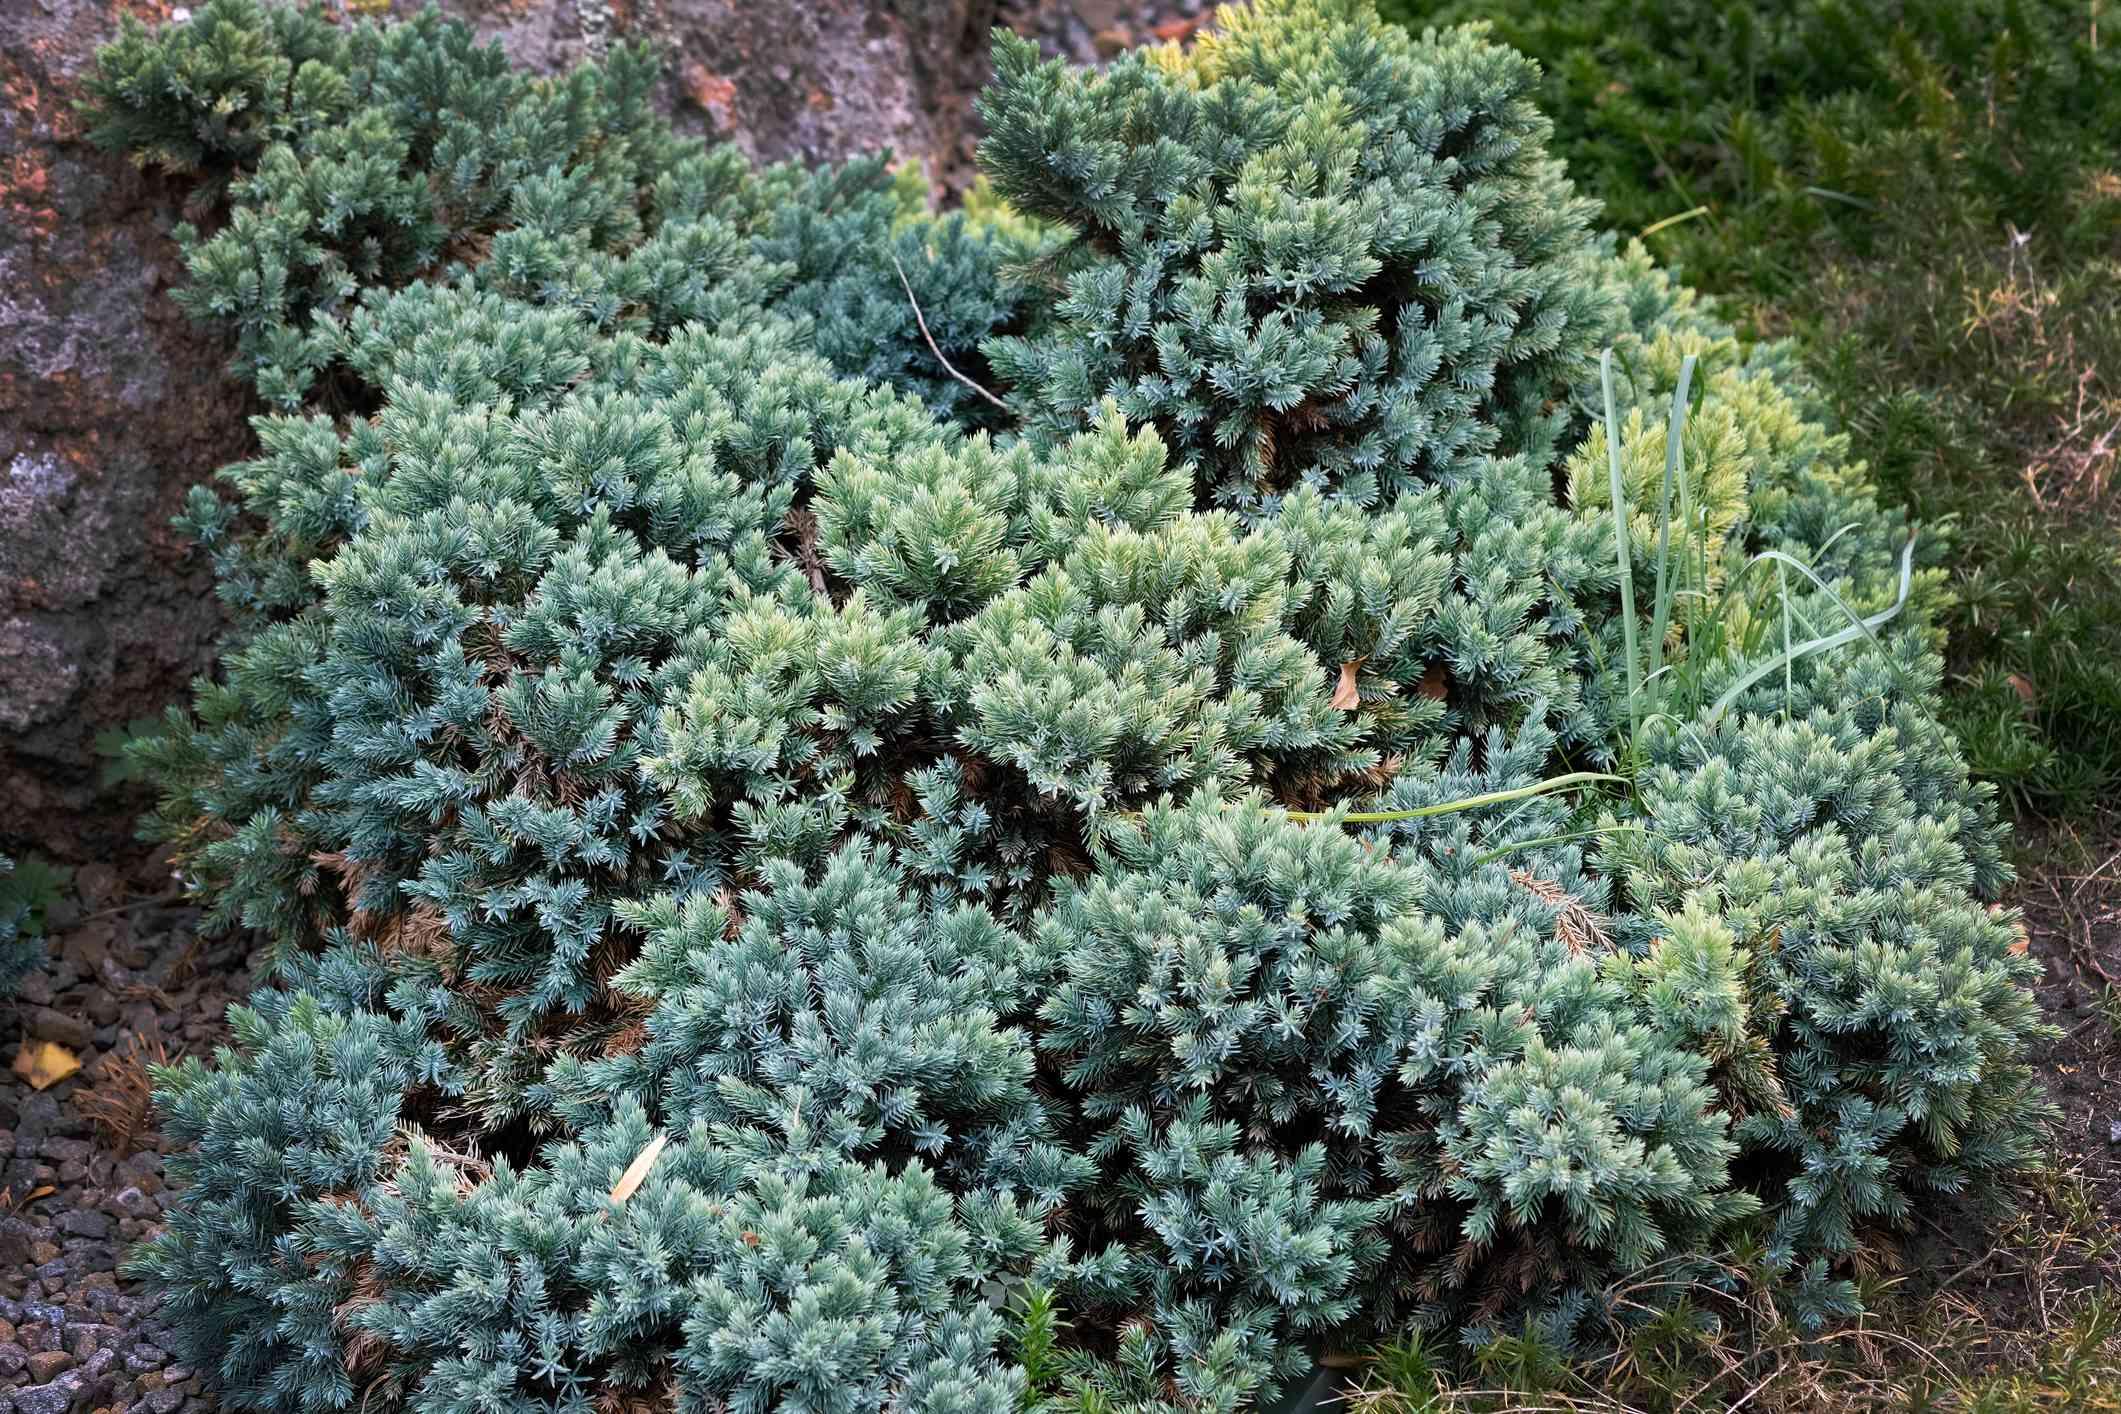 Juniperus squamata es una especie de enebro nativa del Himalaya